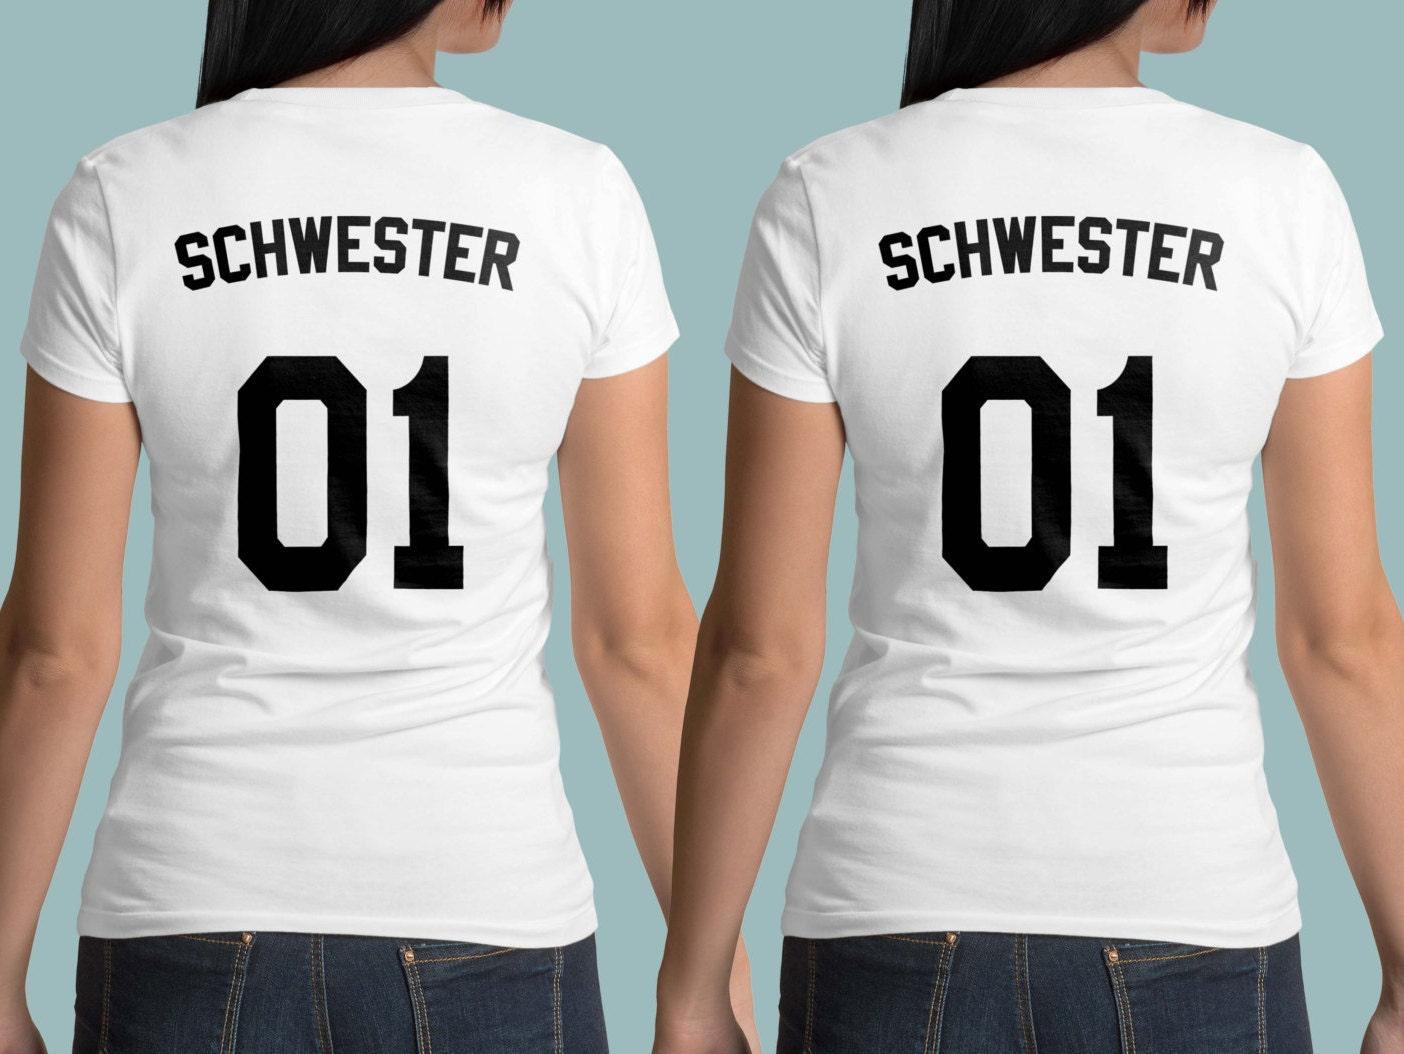 schwester t shirts sister 01 shirt geschwister shirts. Black Bedroom Furniture Sets. Home Design Ideas